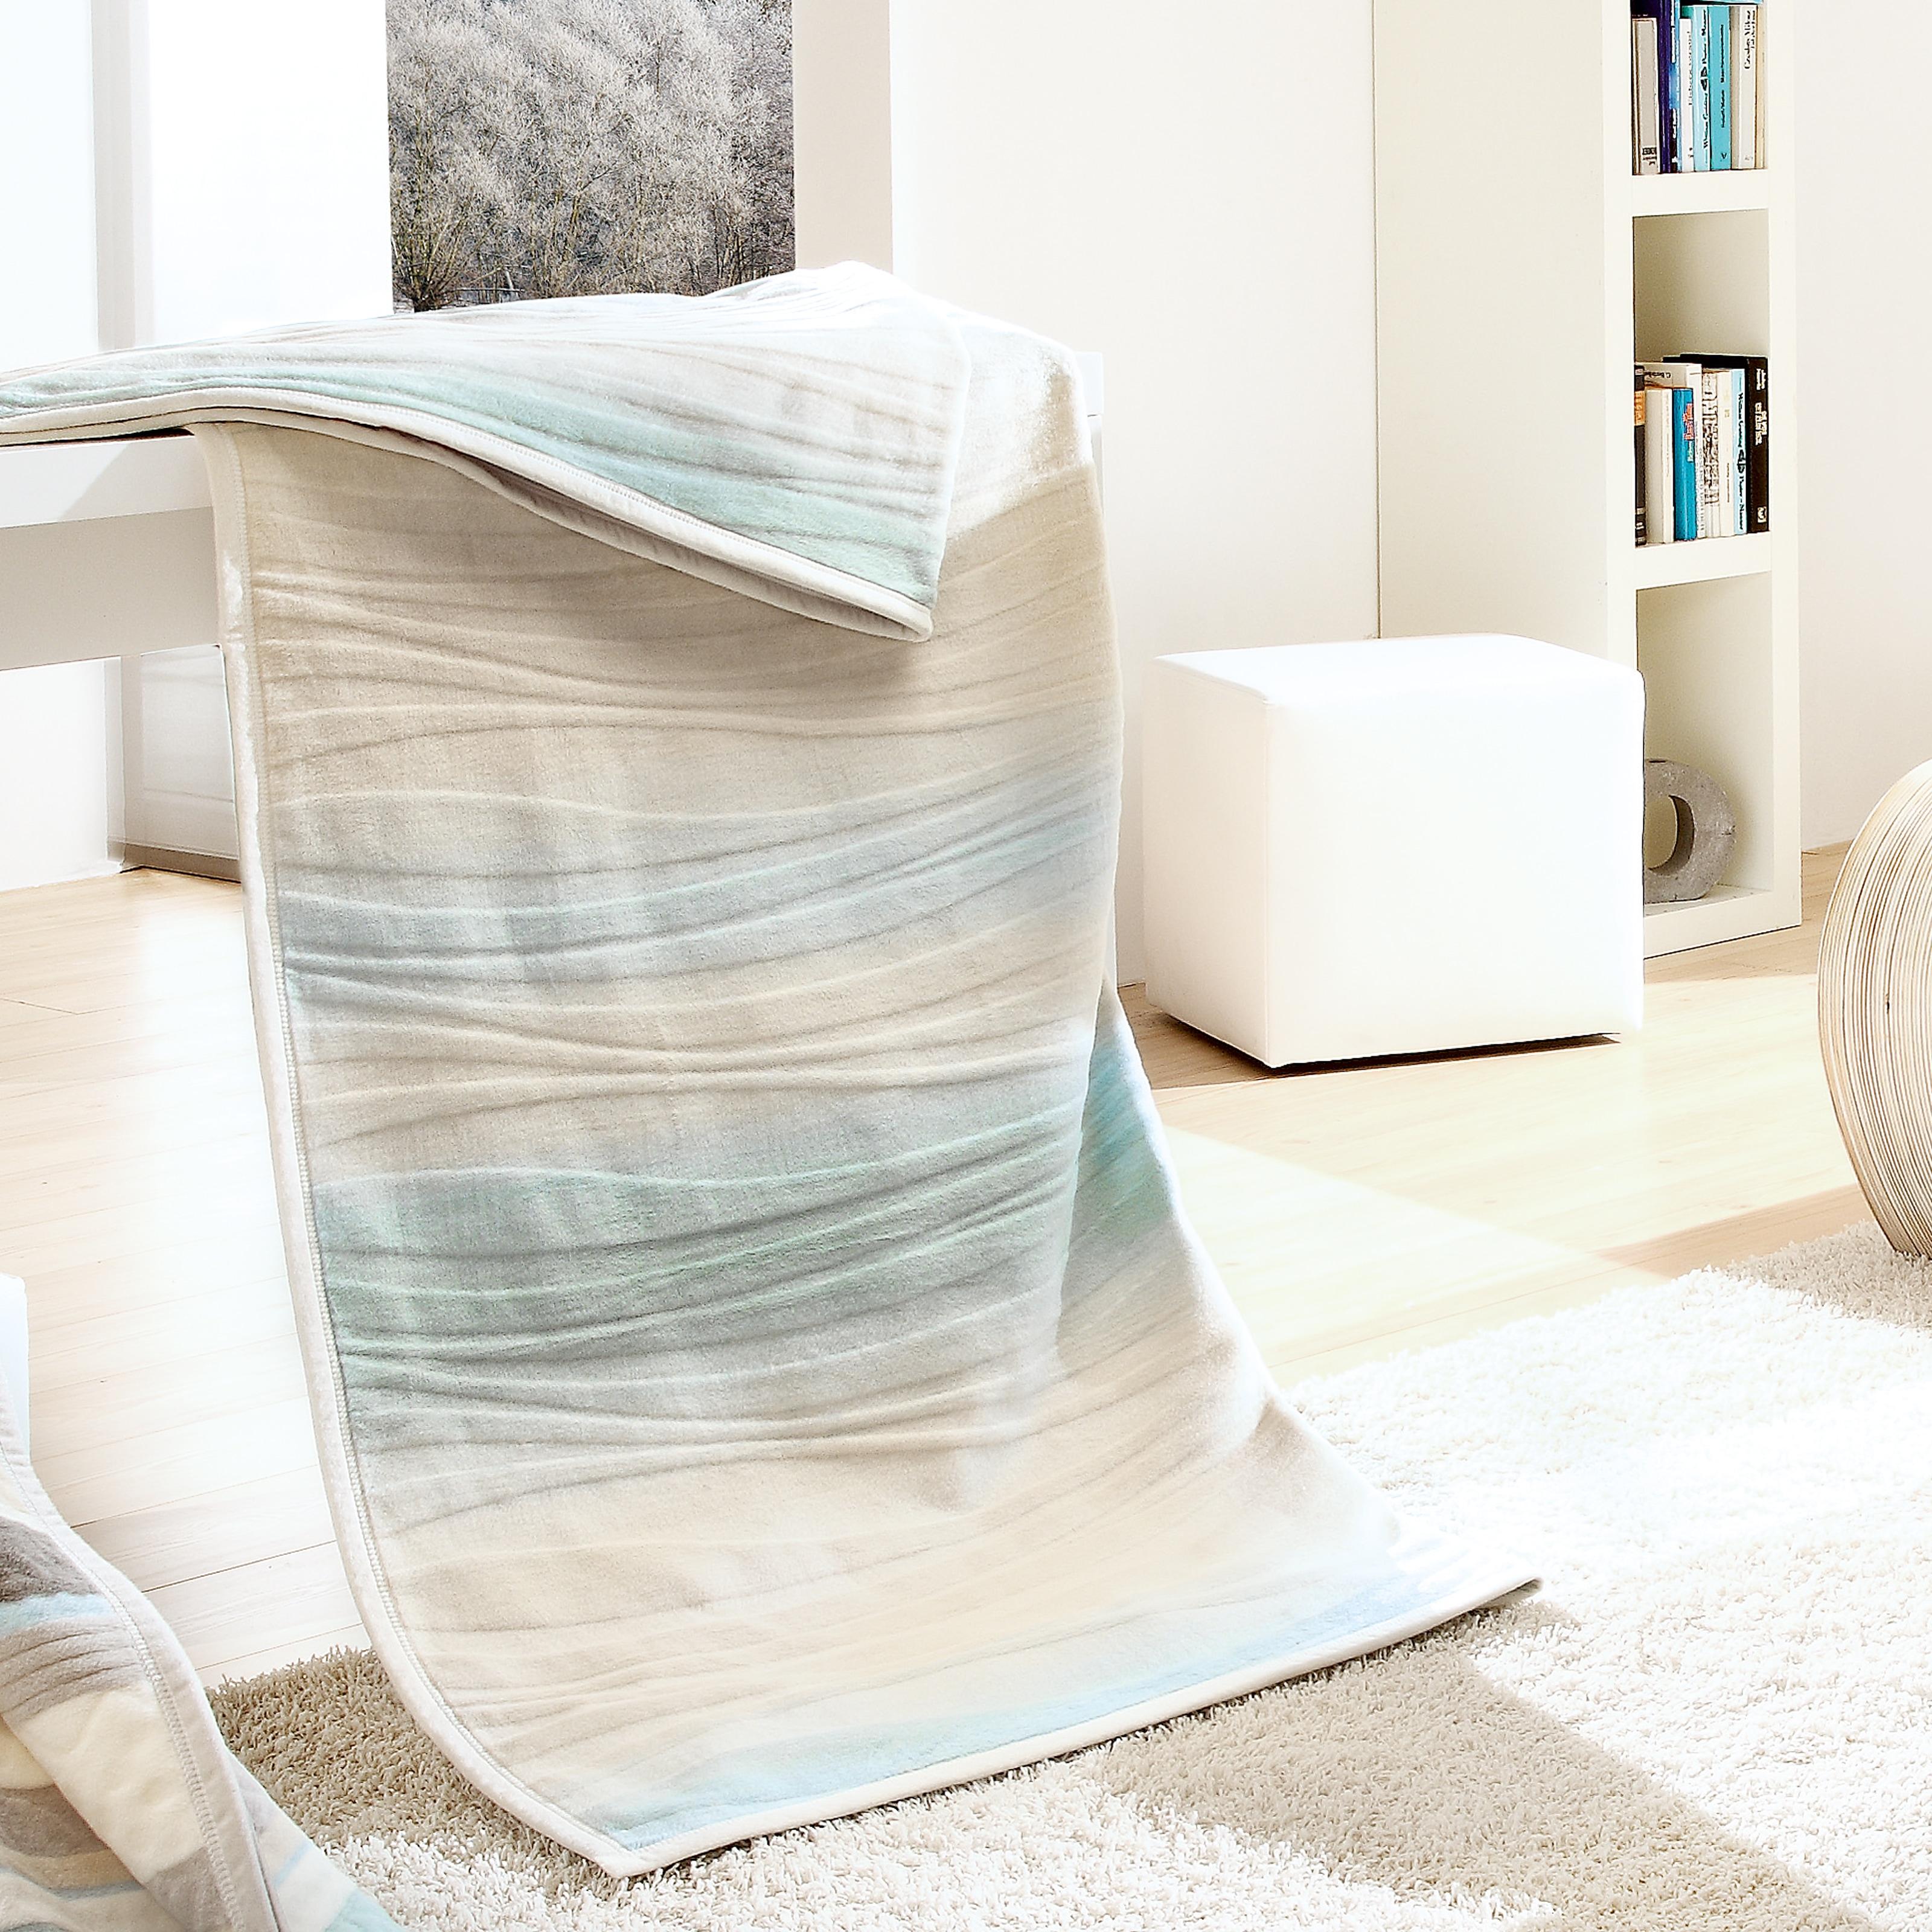 Bocasa Flow Woven Throw Blanket, 60 x 80